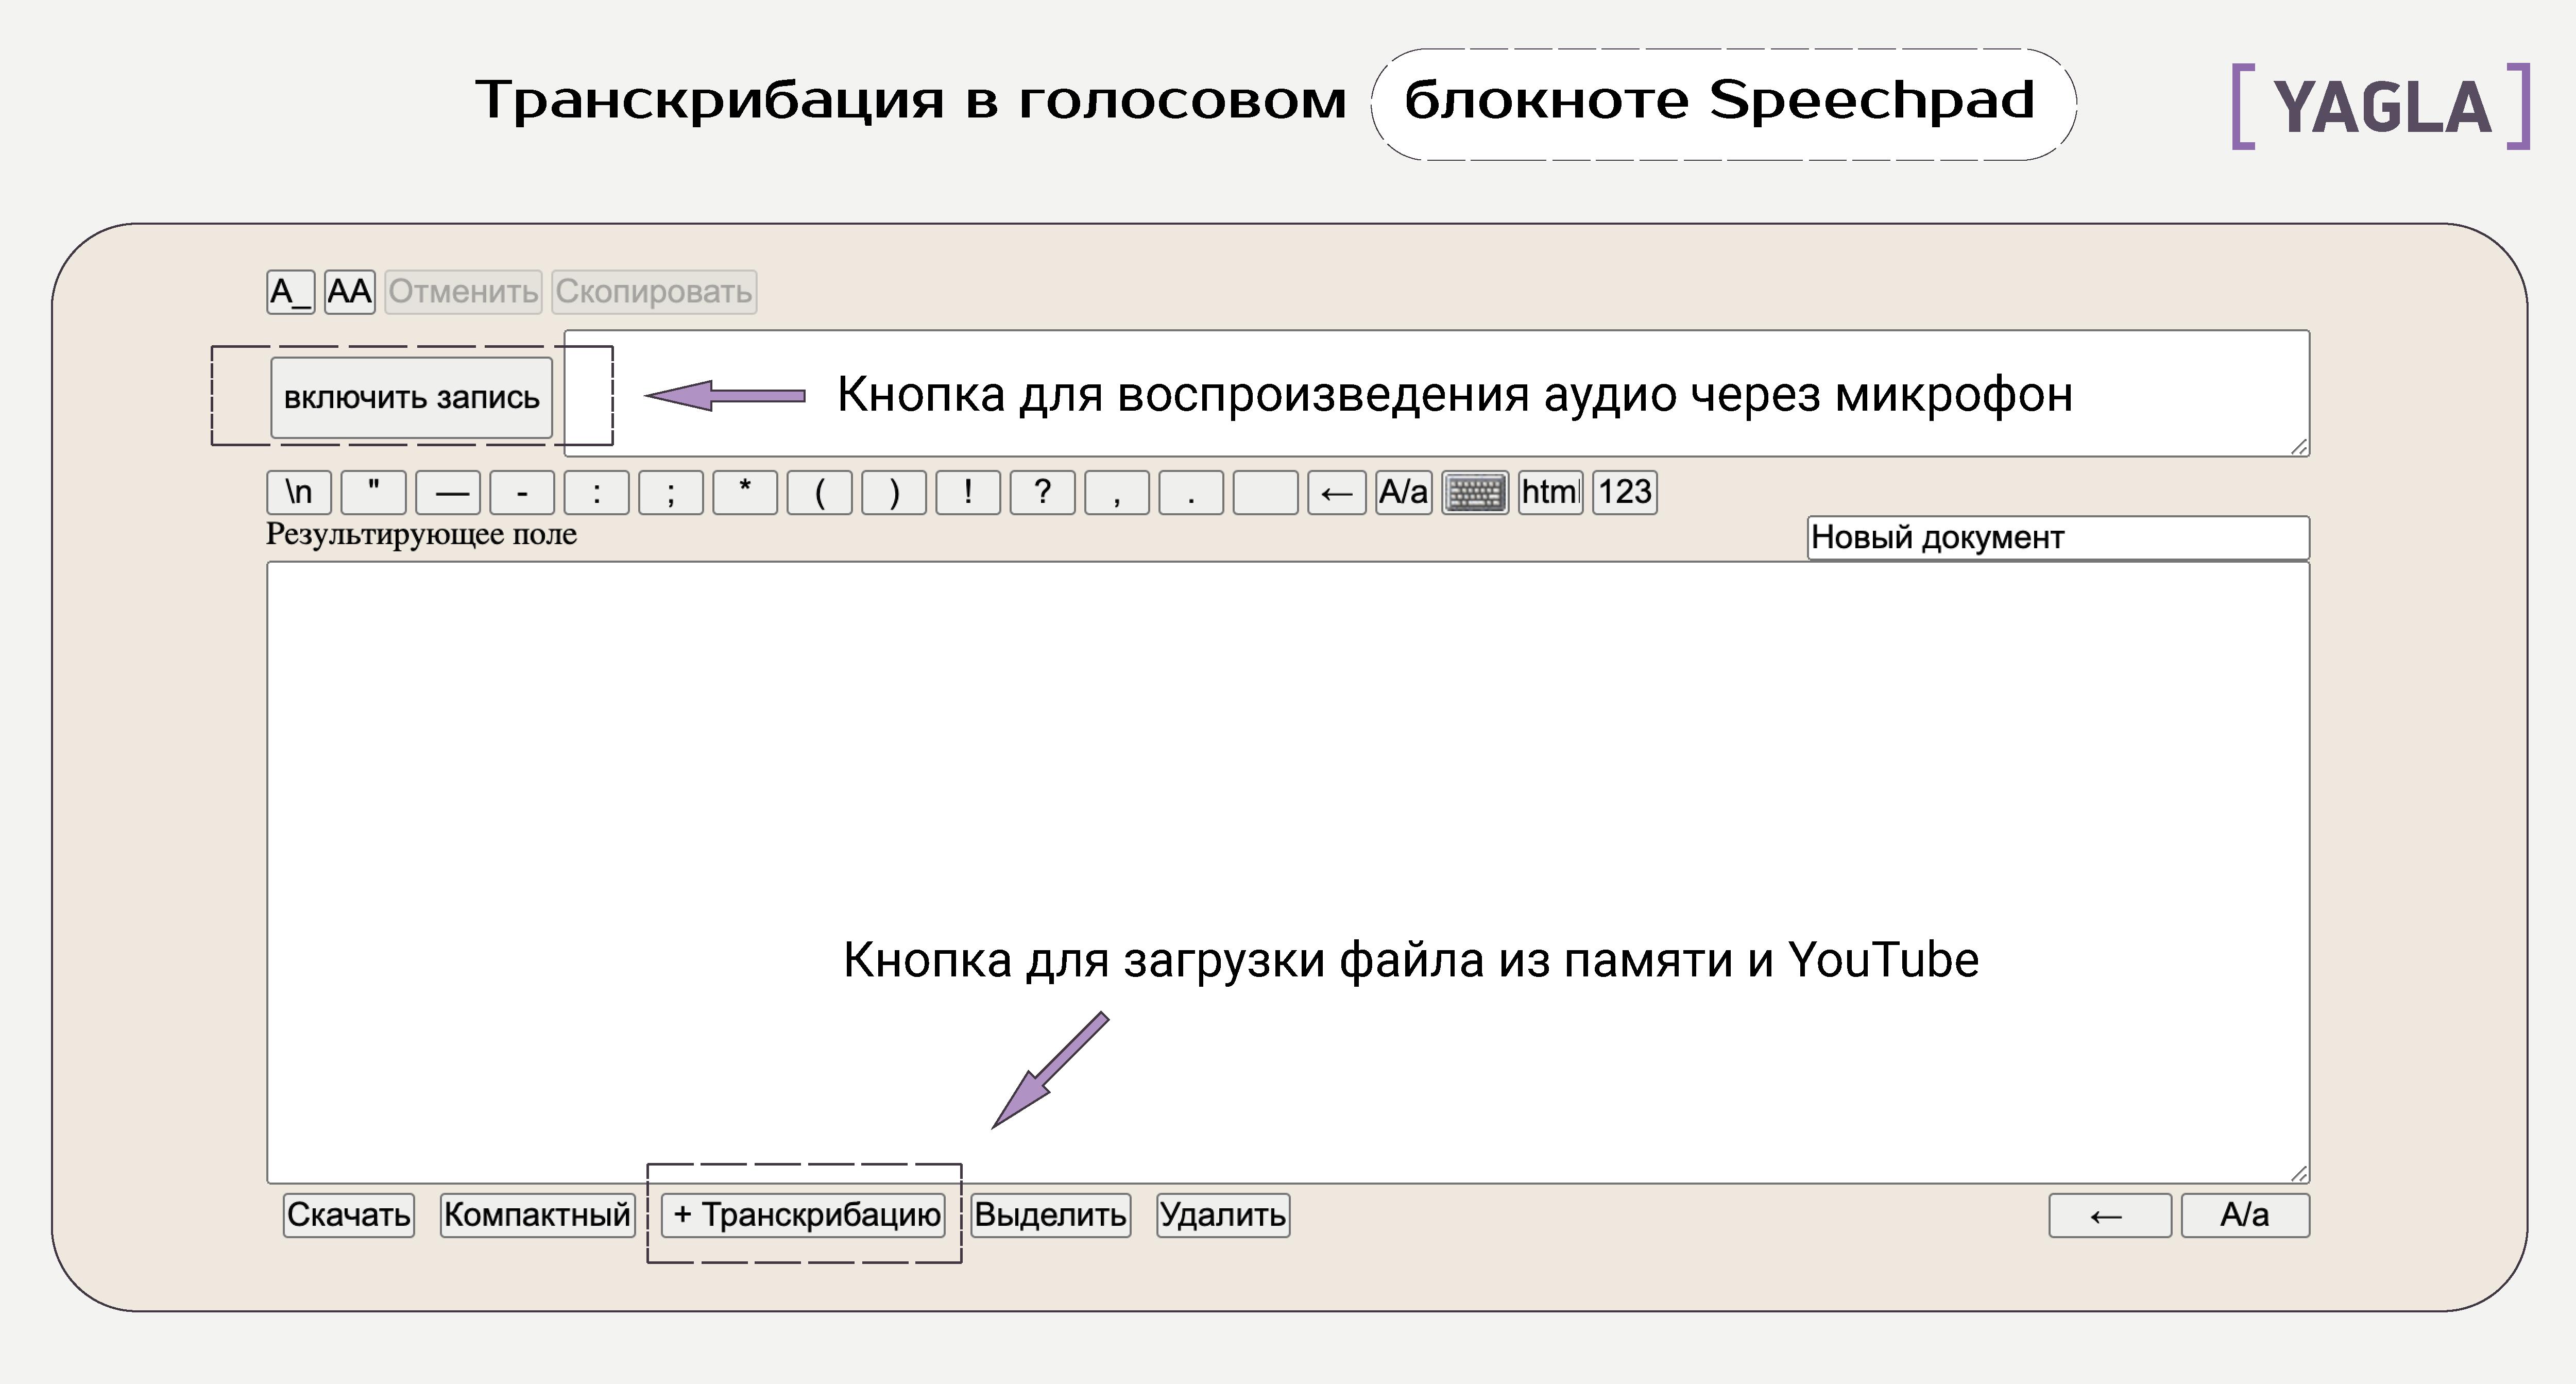 Сервис расшифровки речи в текст в голосовом блокноте Speechpad